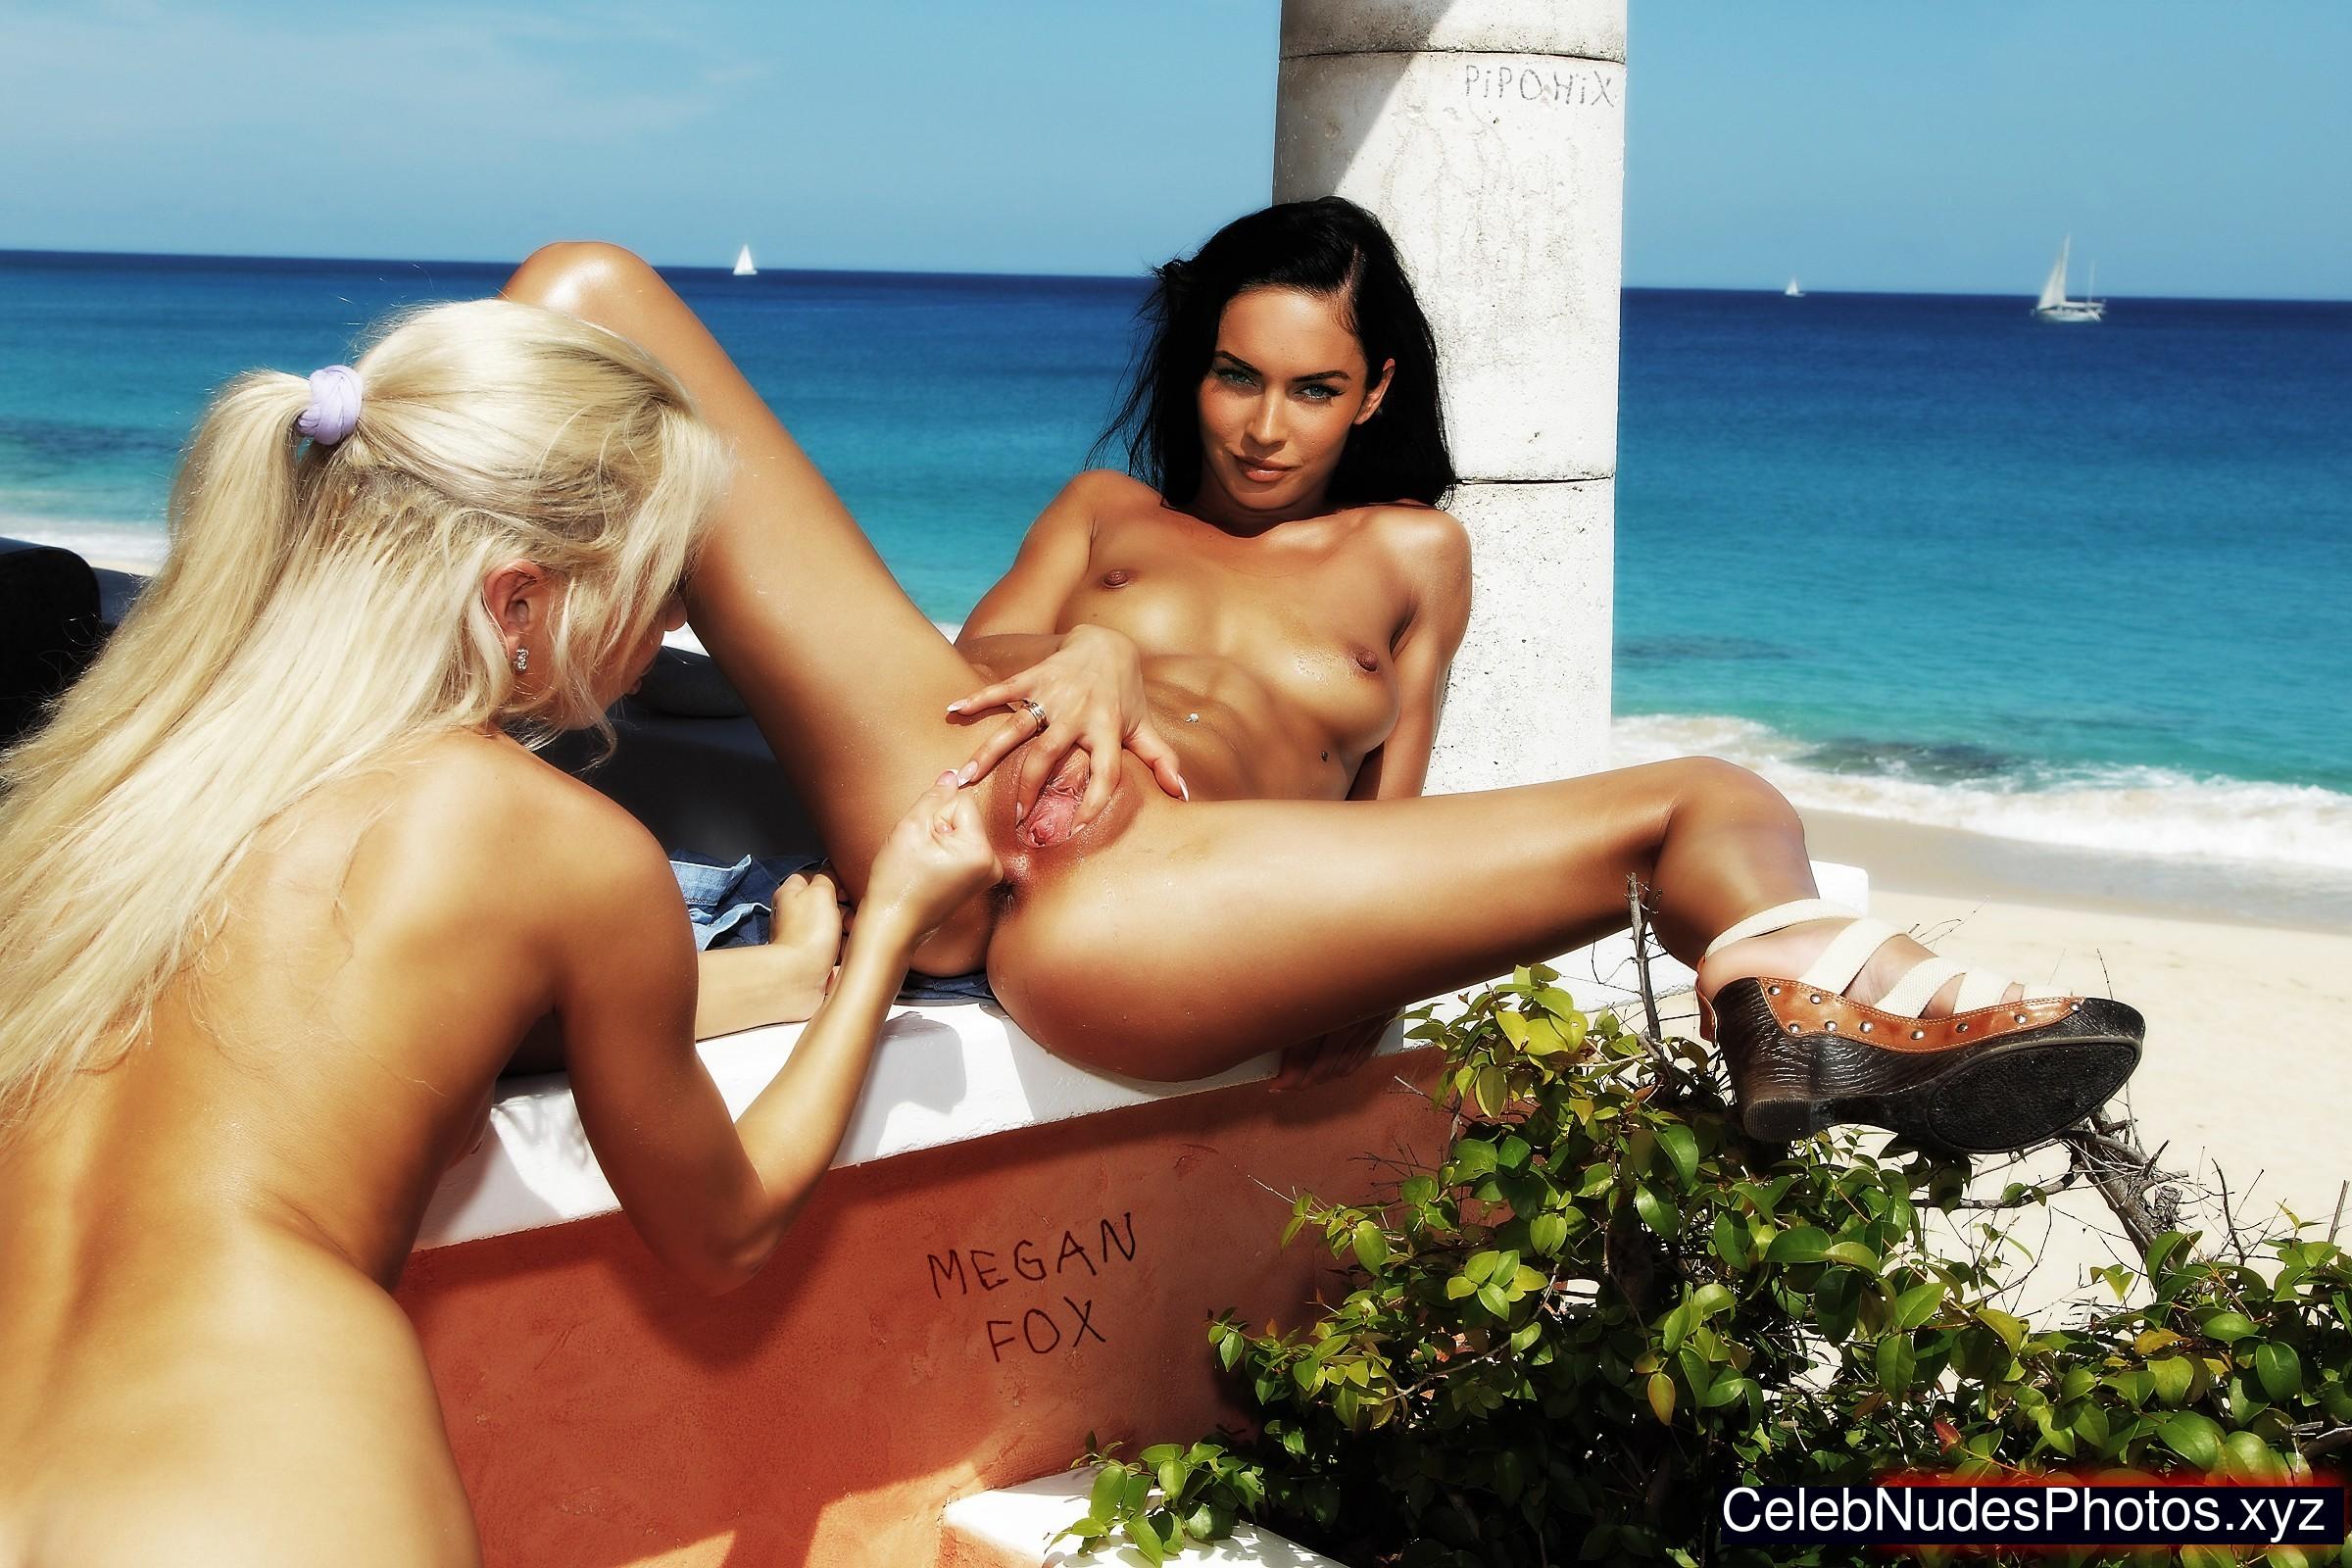 Hot Megan Fox Celeb Nudes Gif